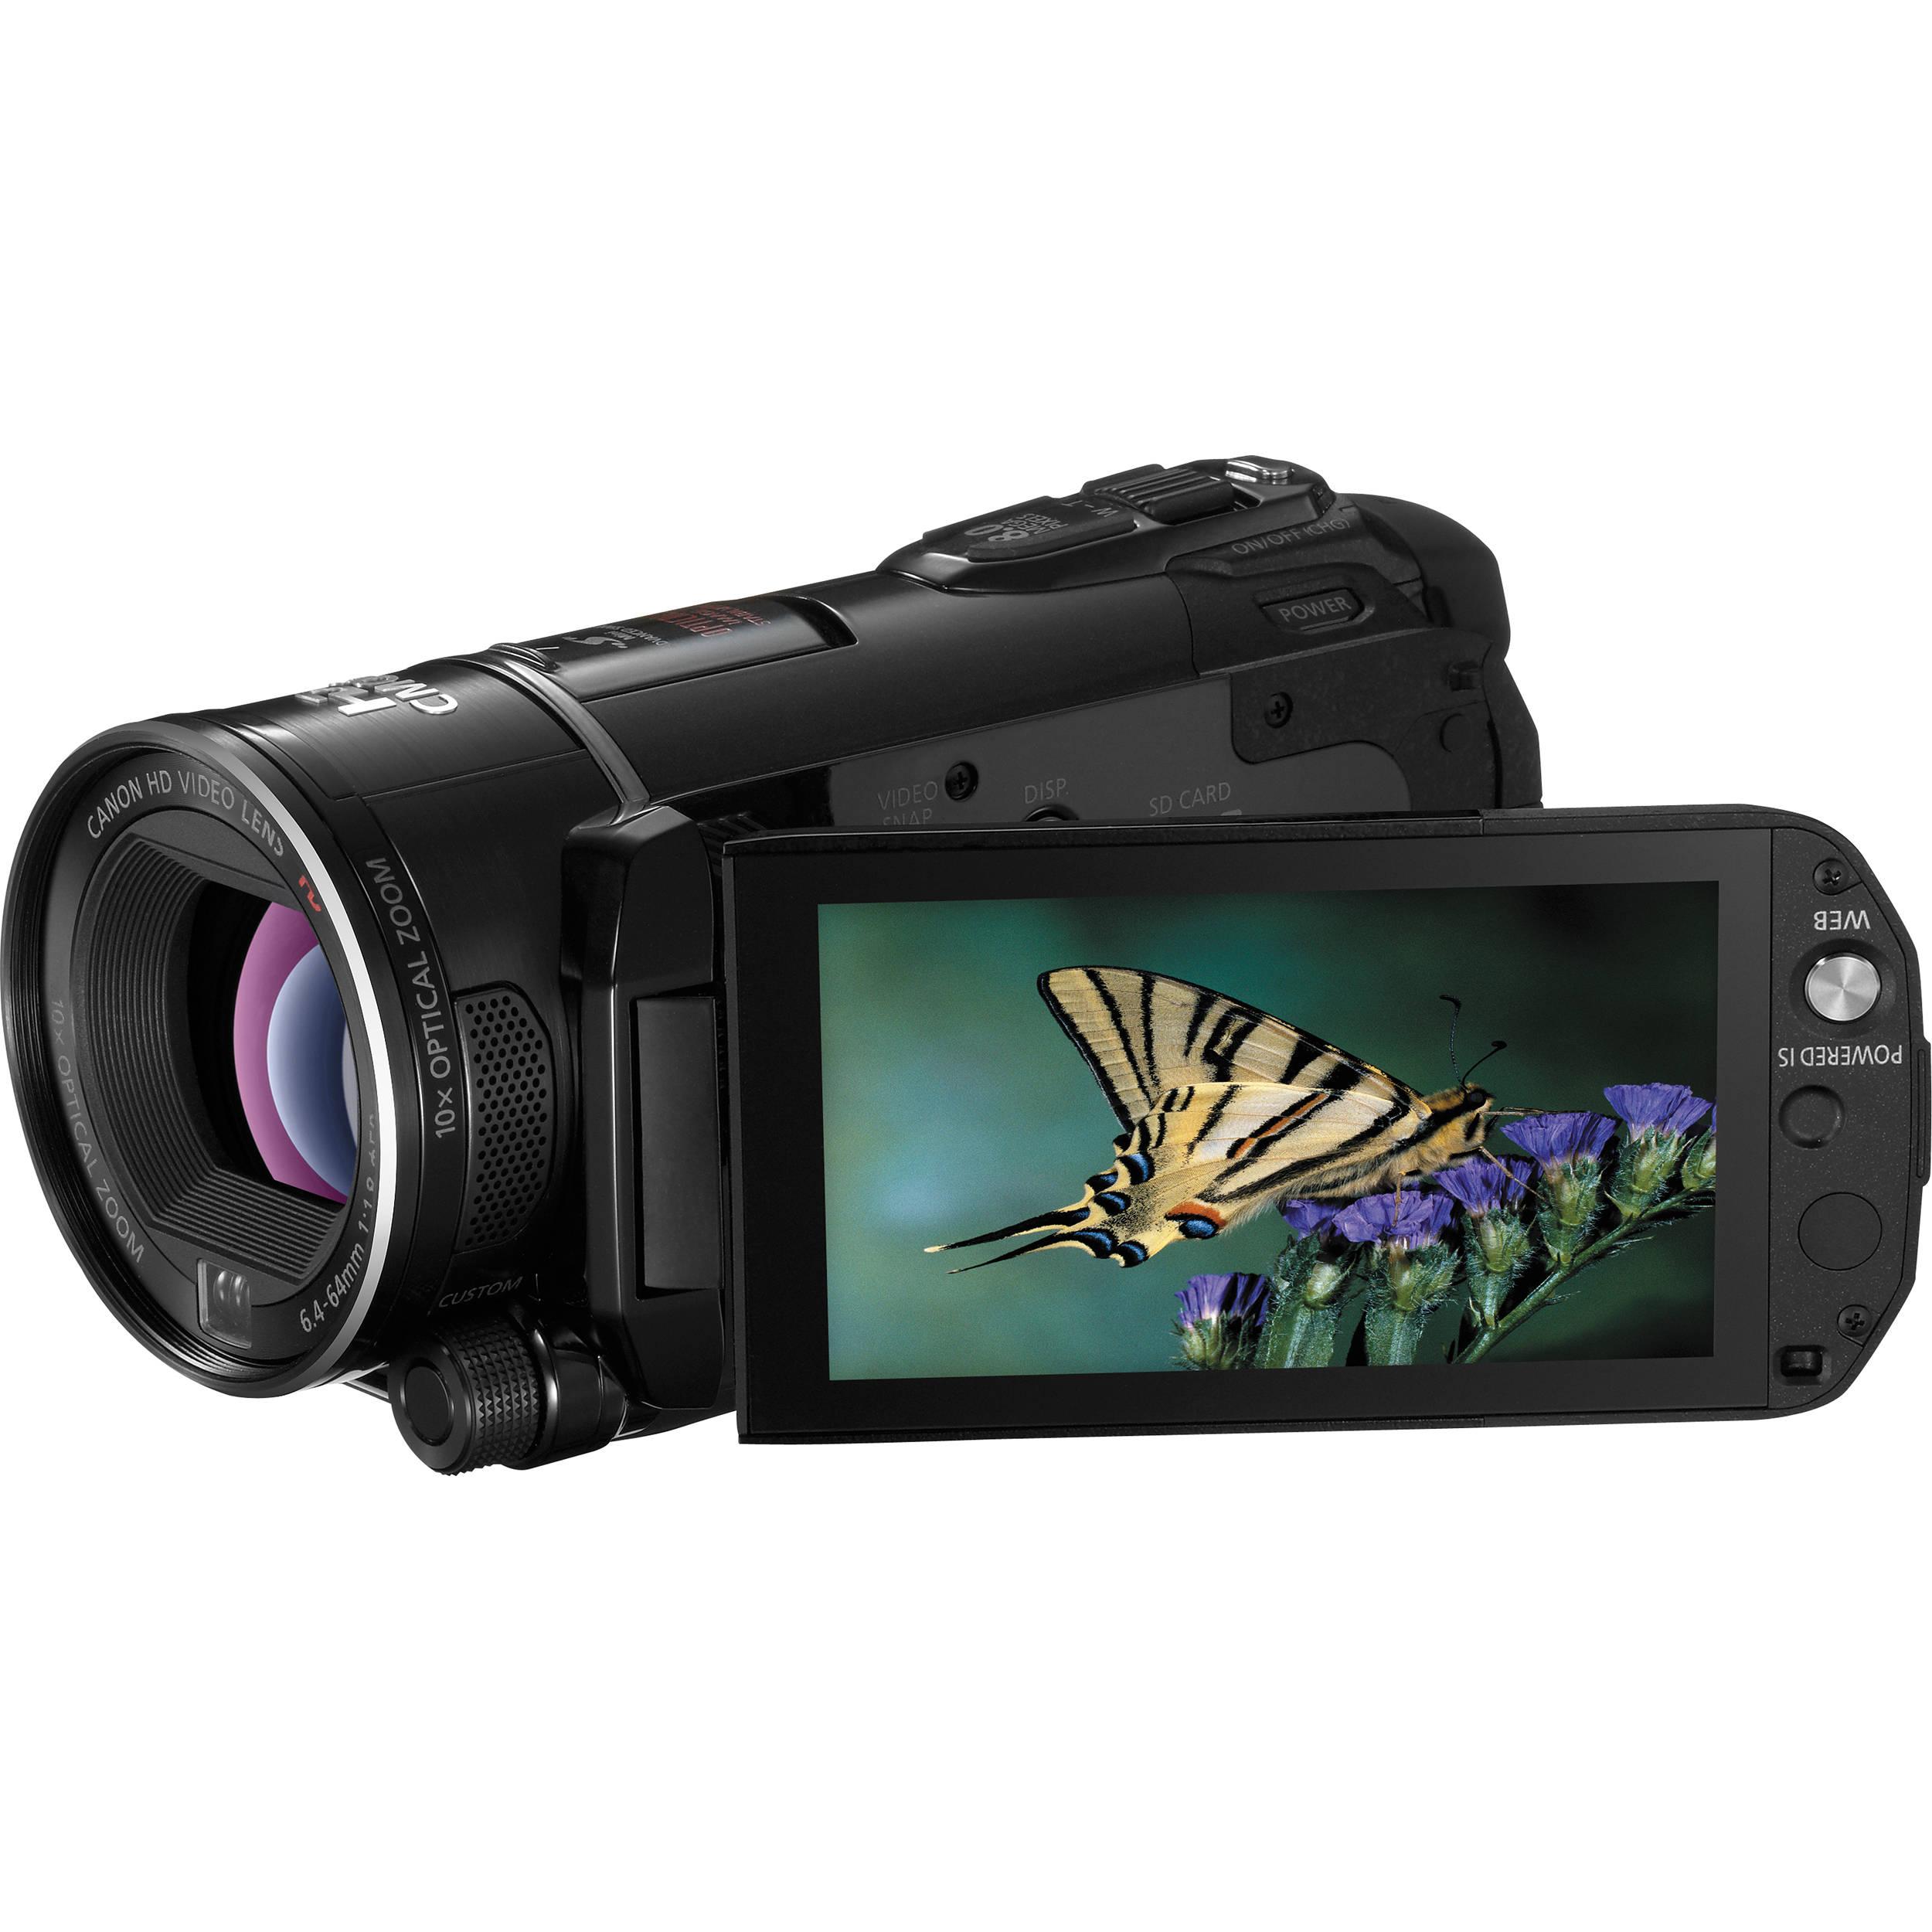 canon vixia hf s21 dual flash memory camcorder 4374b001 b h rh bhphotovideo com canon vixia hf21 manual pdf canon vixia hf21 software